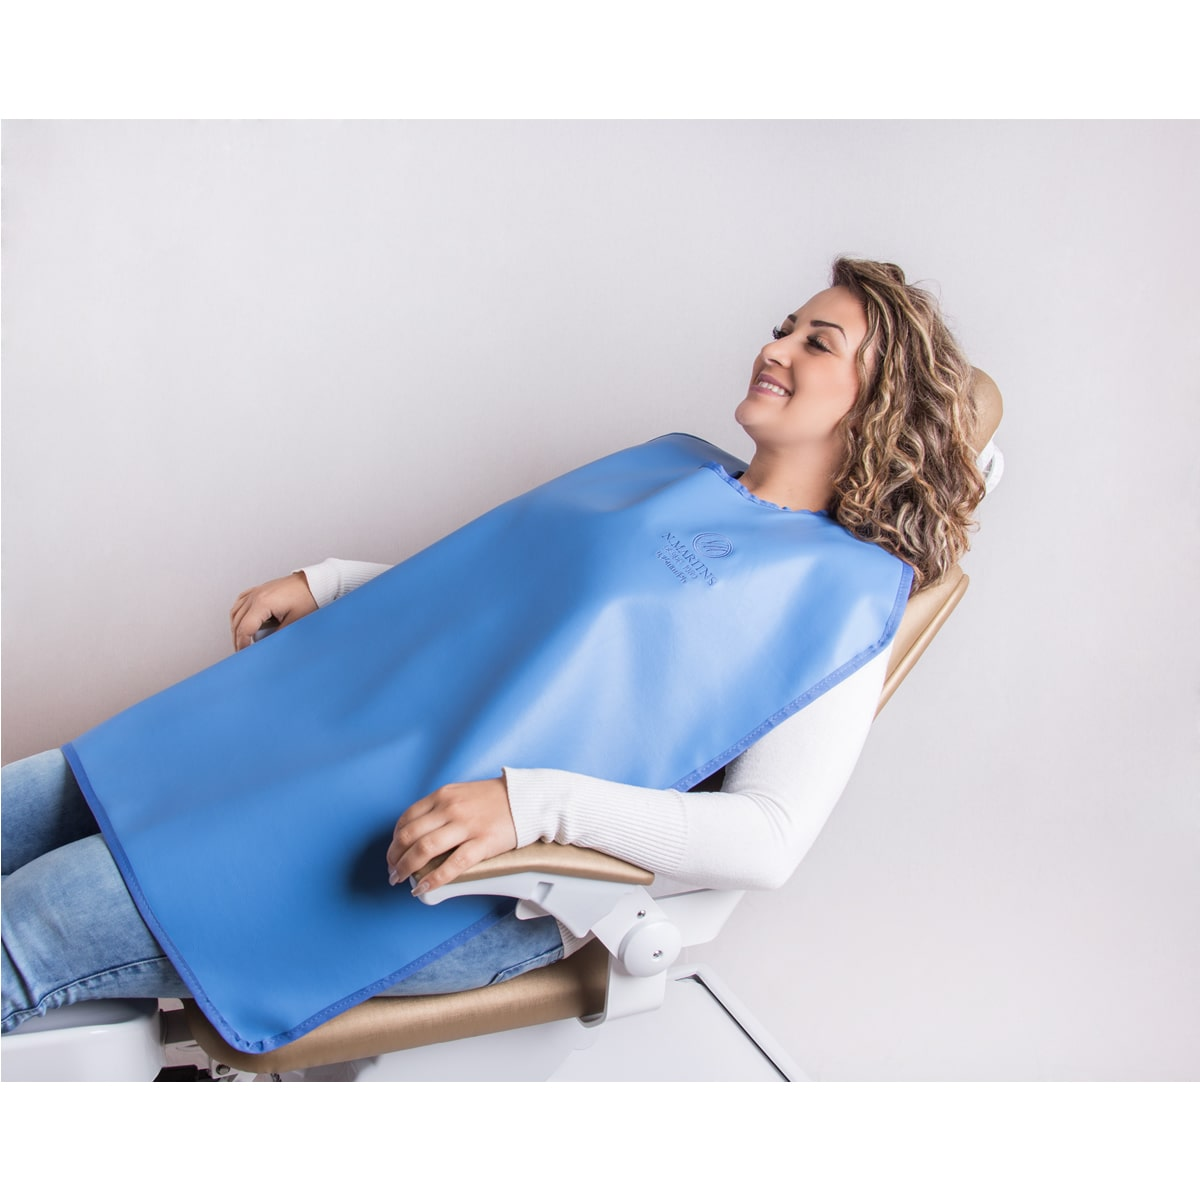 Avental Periapical sem protetor de tireoide - 85x60cm - 0,25mm/Pb - N.Martins